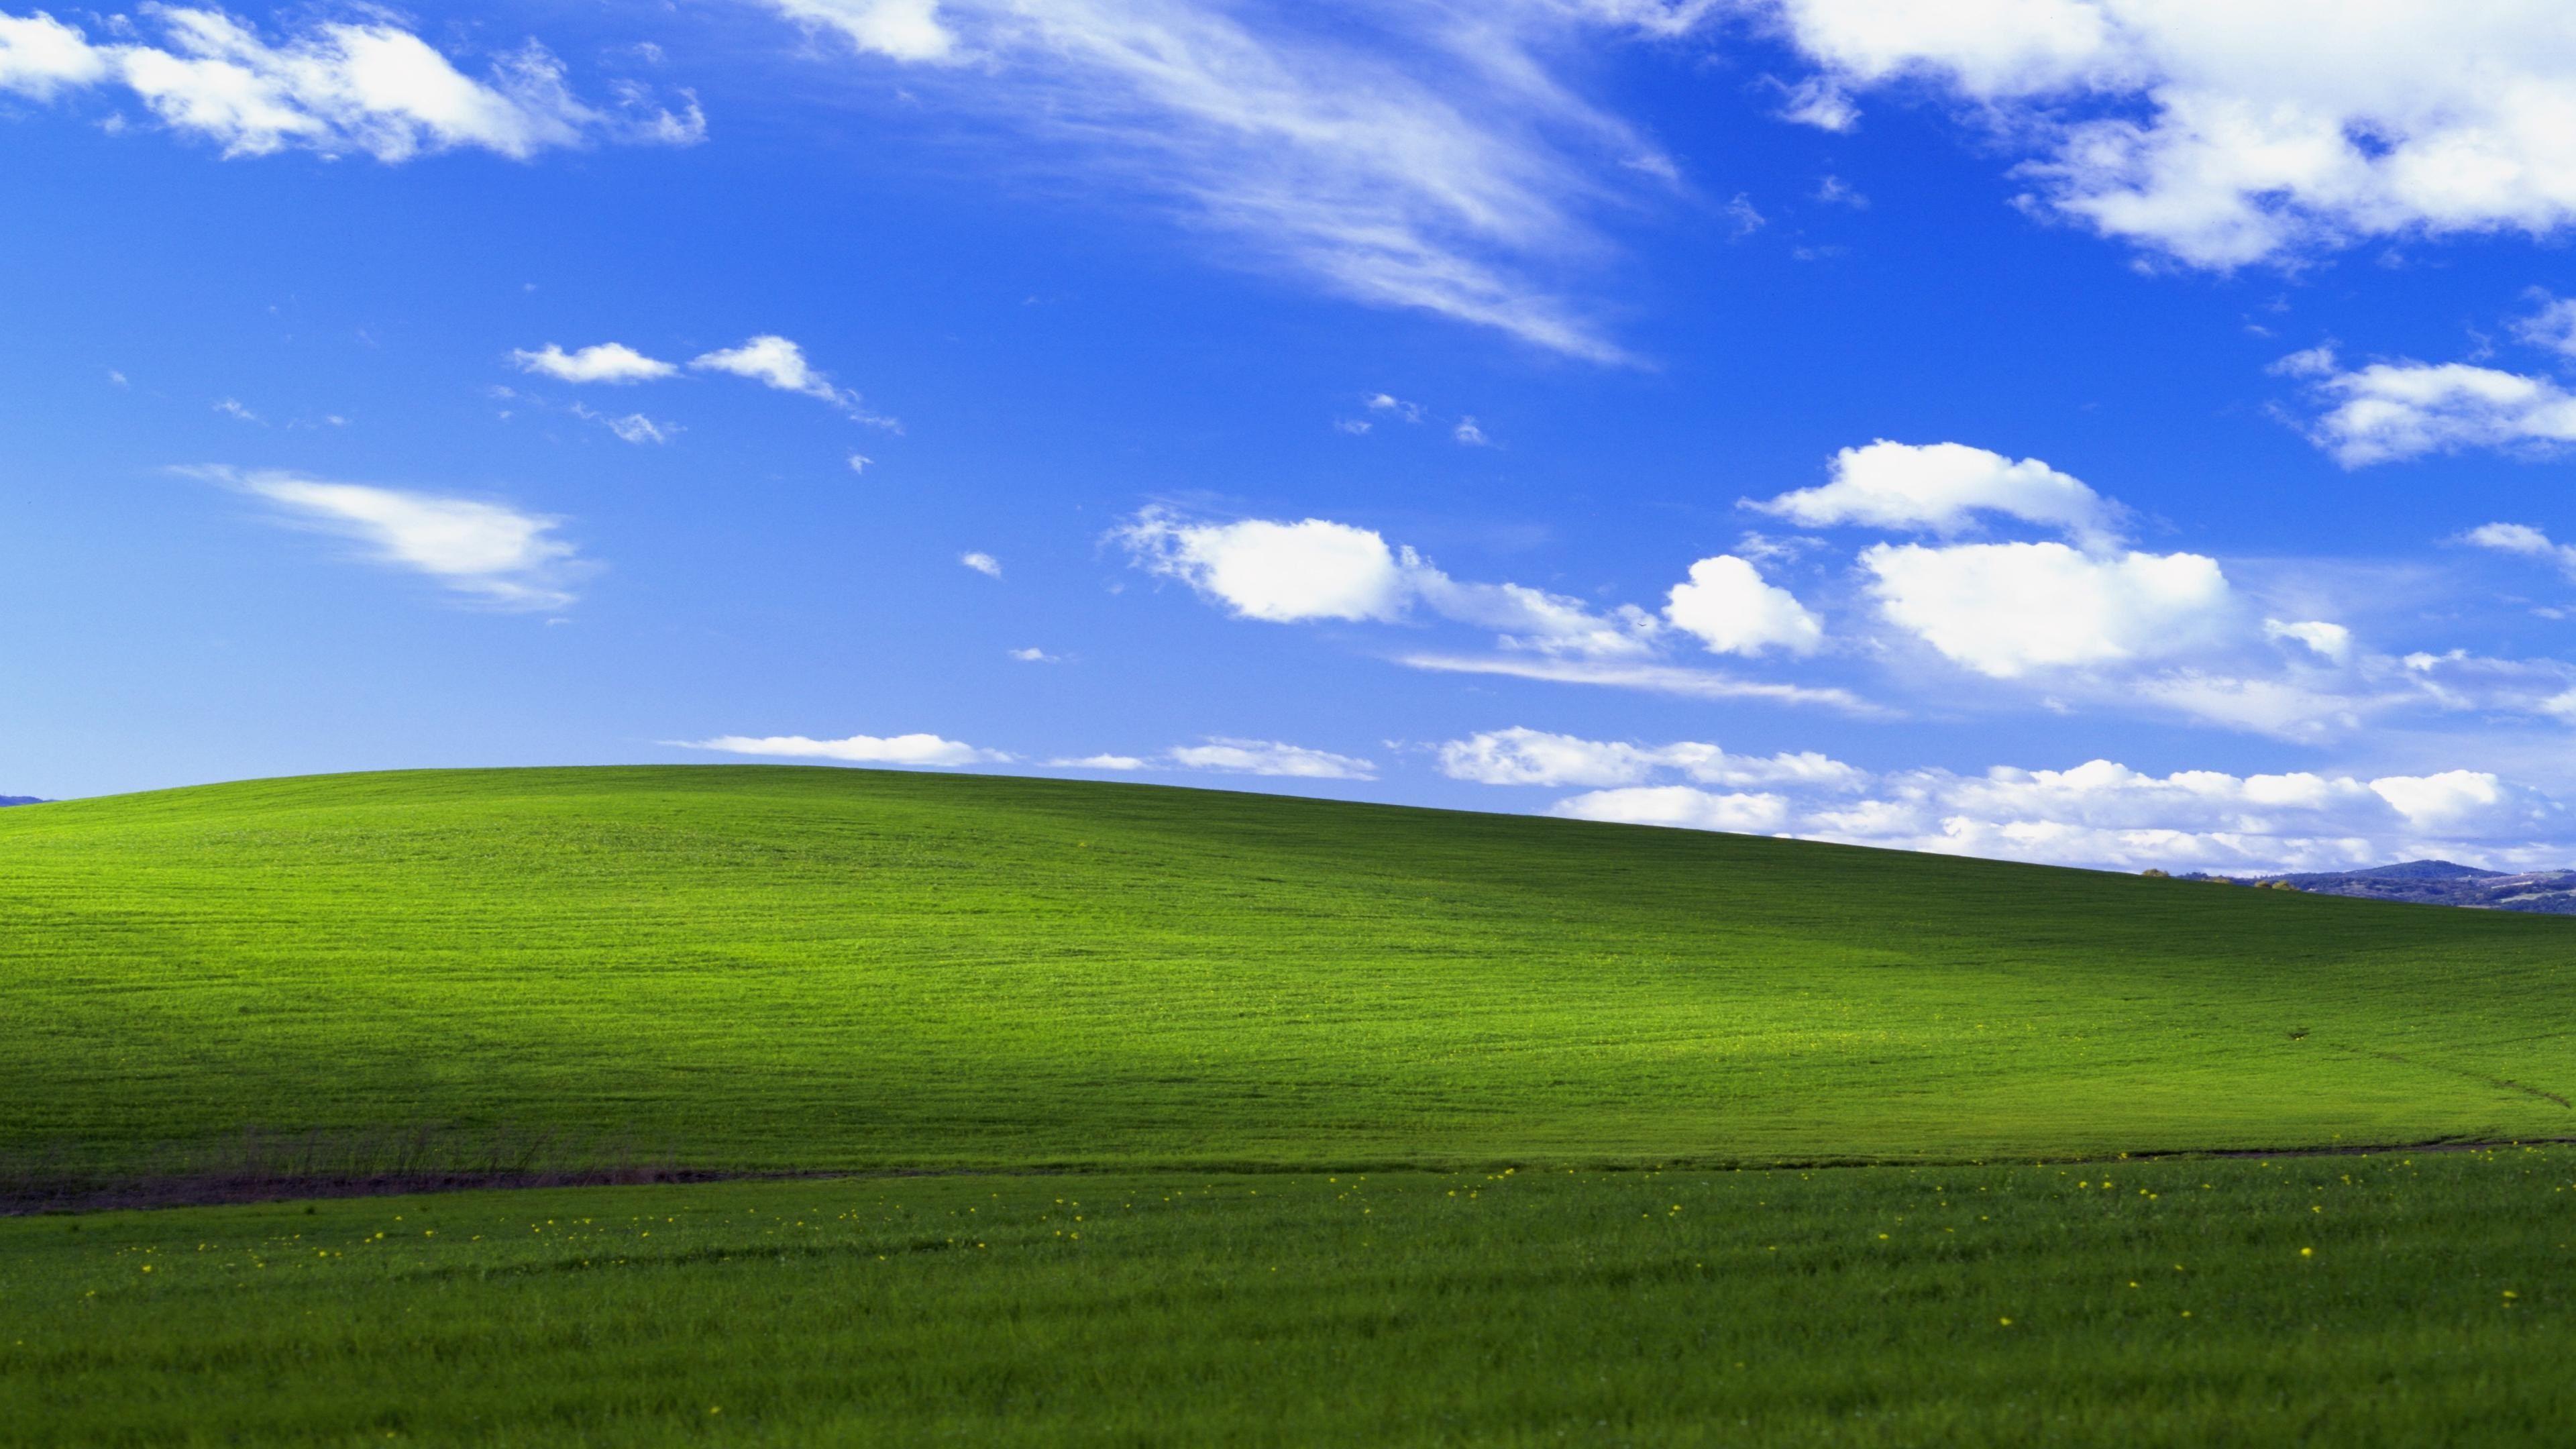 windows xp bliss 4k Desktop